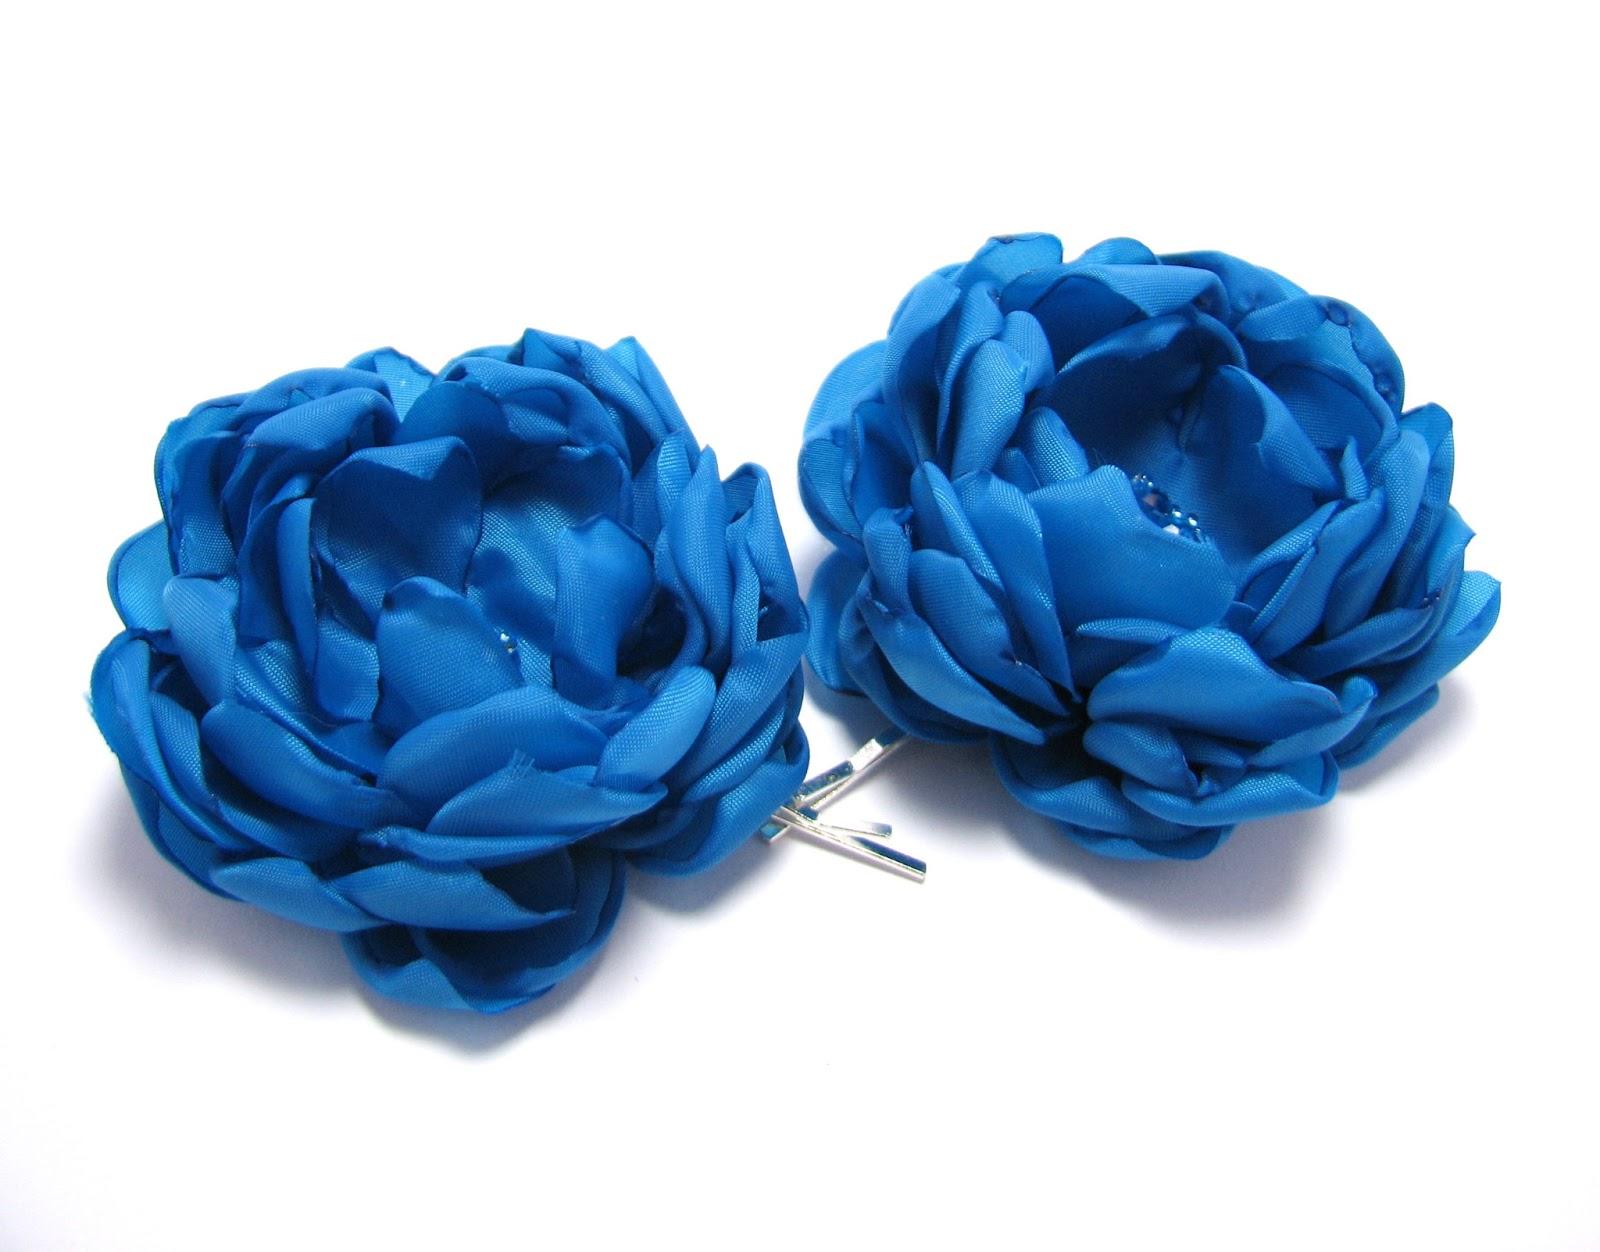 Royal Blue ~ Maybe Navy Blue